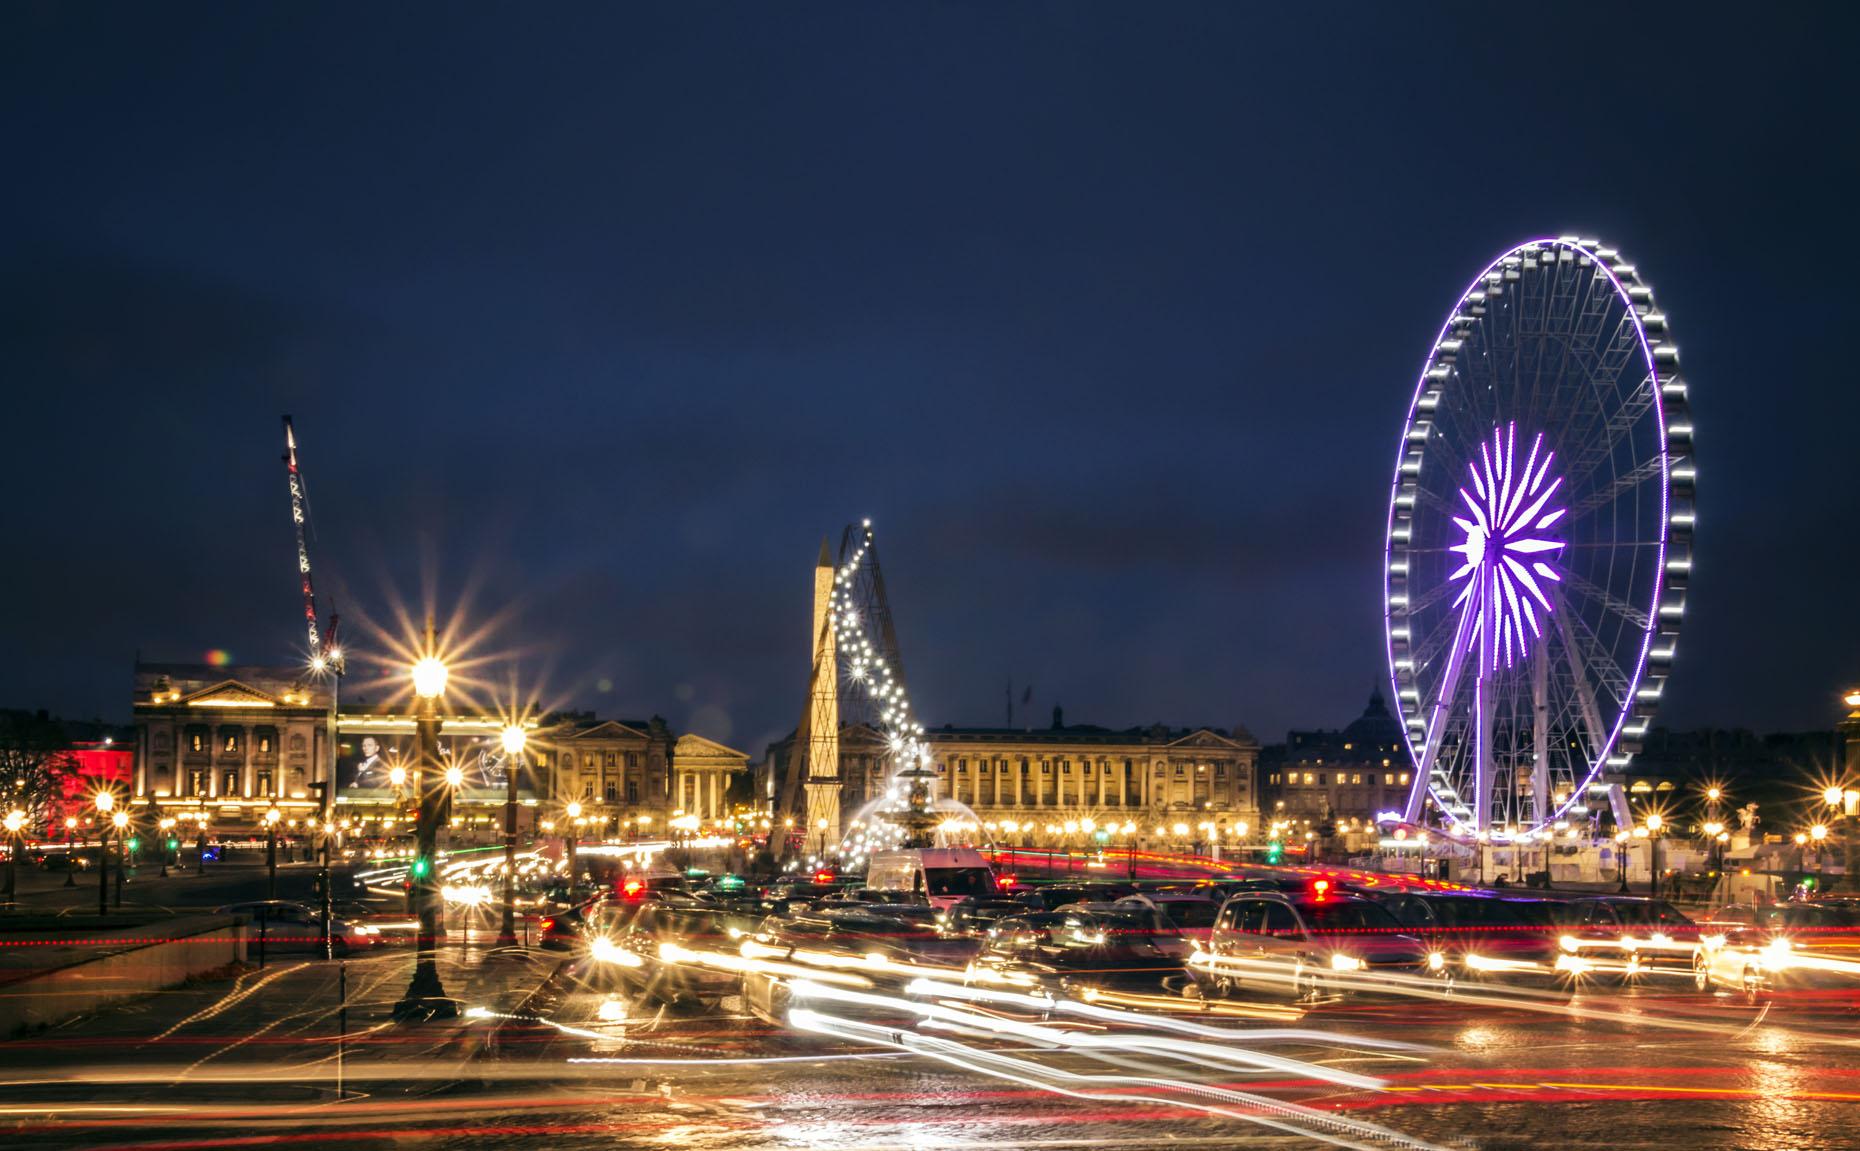 Paris_ConcordPlaza_02.jpg